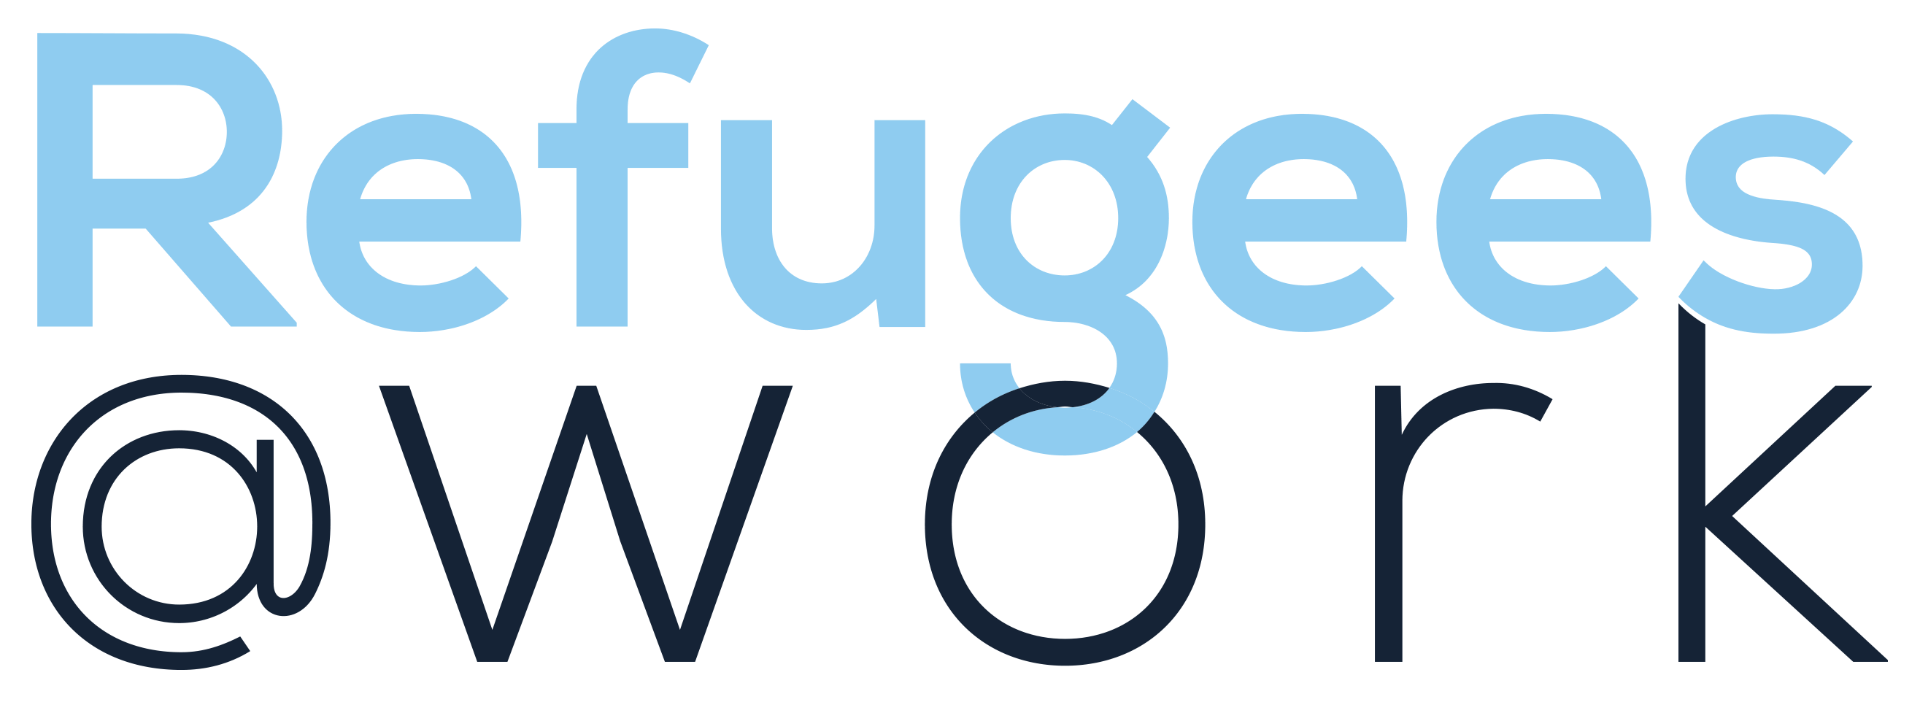 RefugeesAtWork_Logo_RVB.png